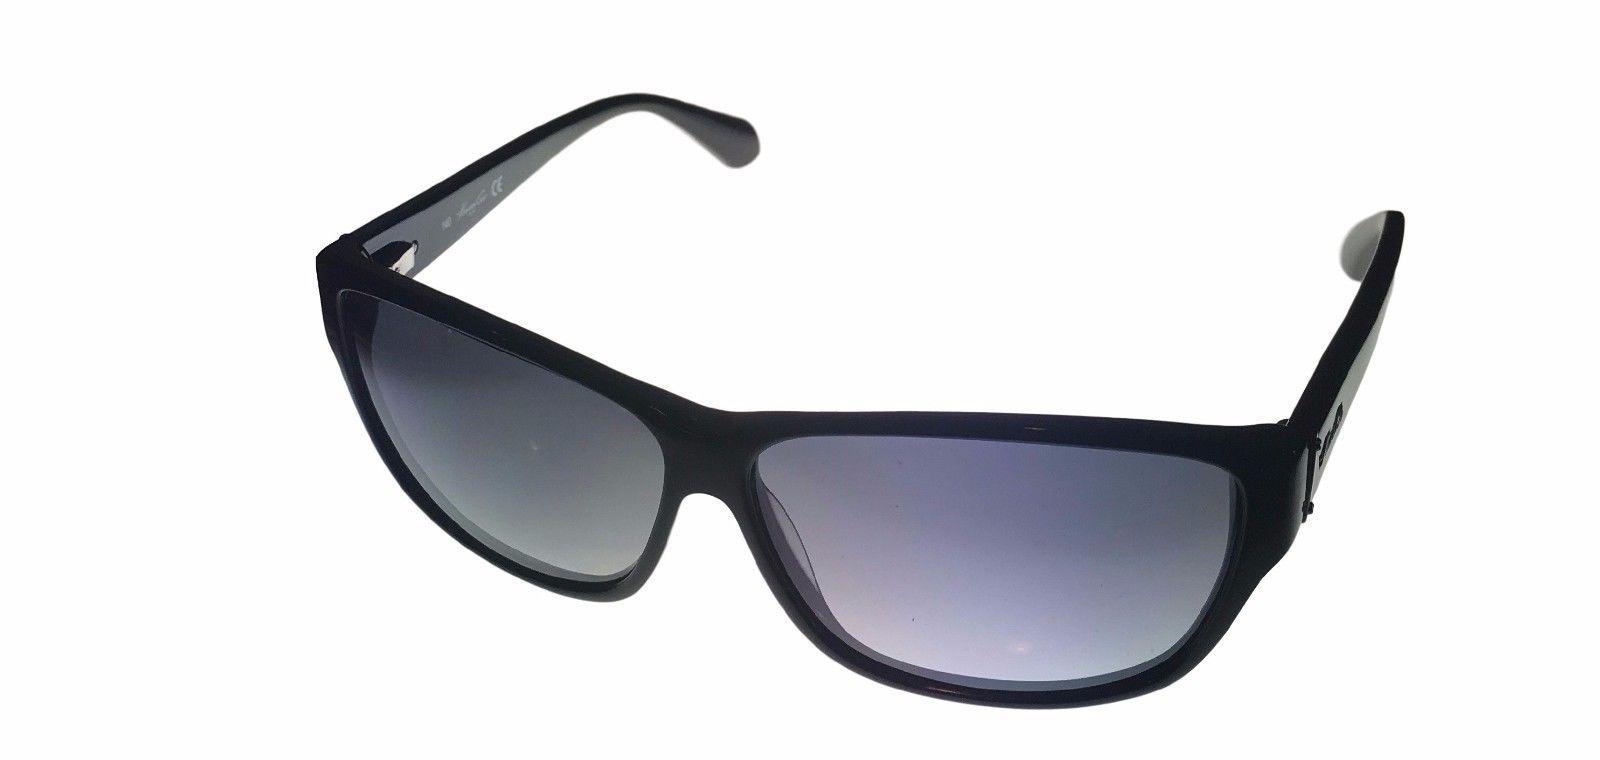 Kenneth Cole New York Mens Sunglass Soft Square Black, Smoke Lens KC7034 1B